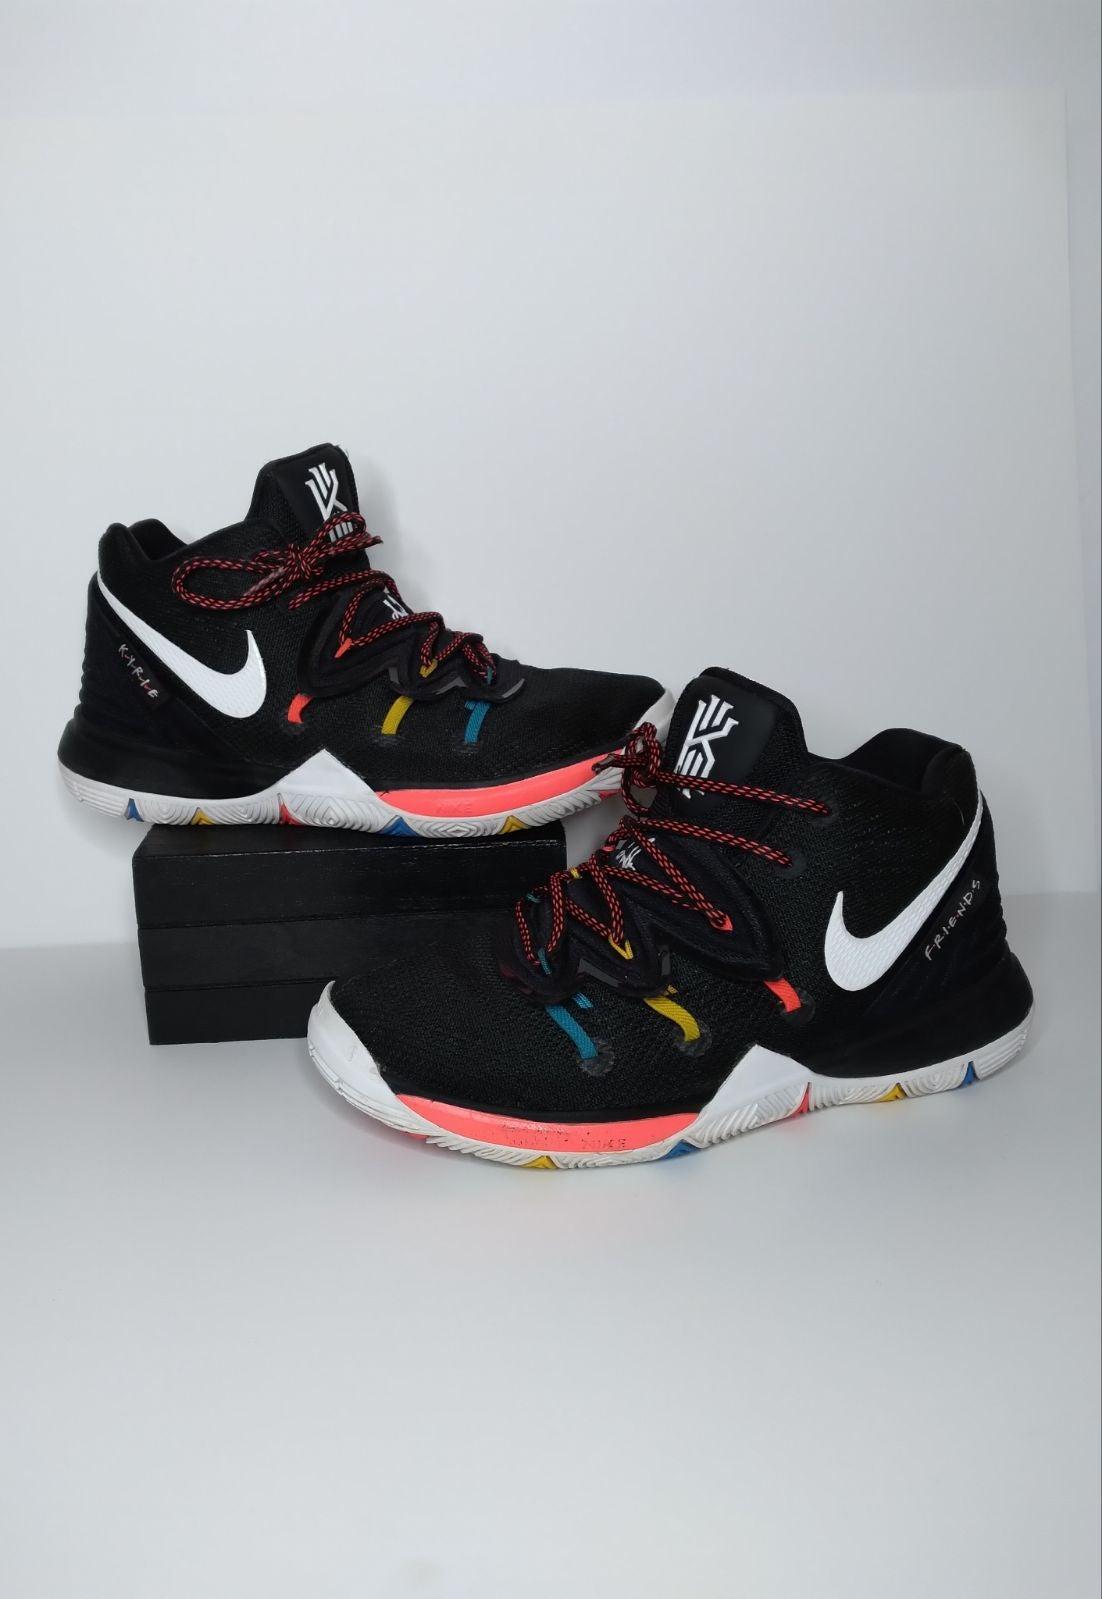 Nike J's Kyrie 5 Friends Multicolor Kick